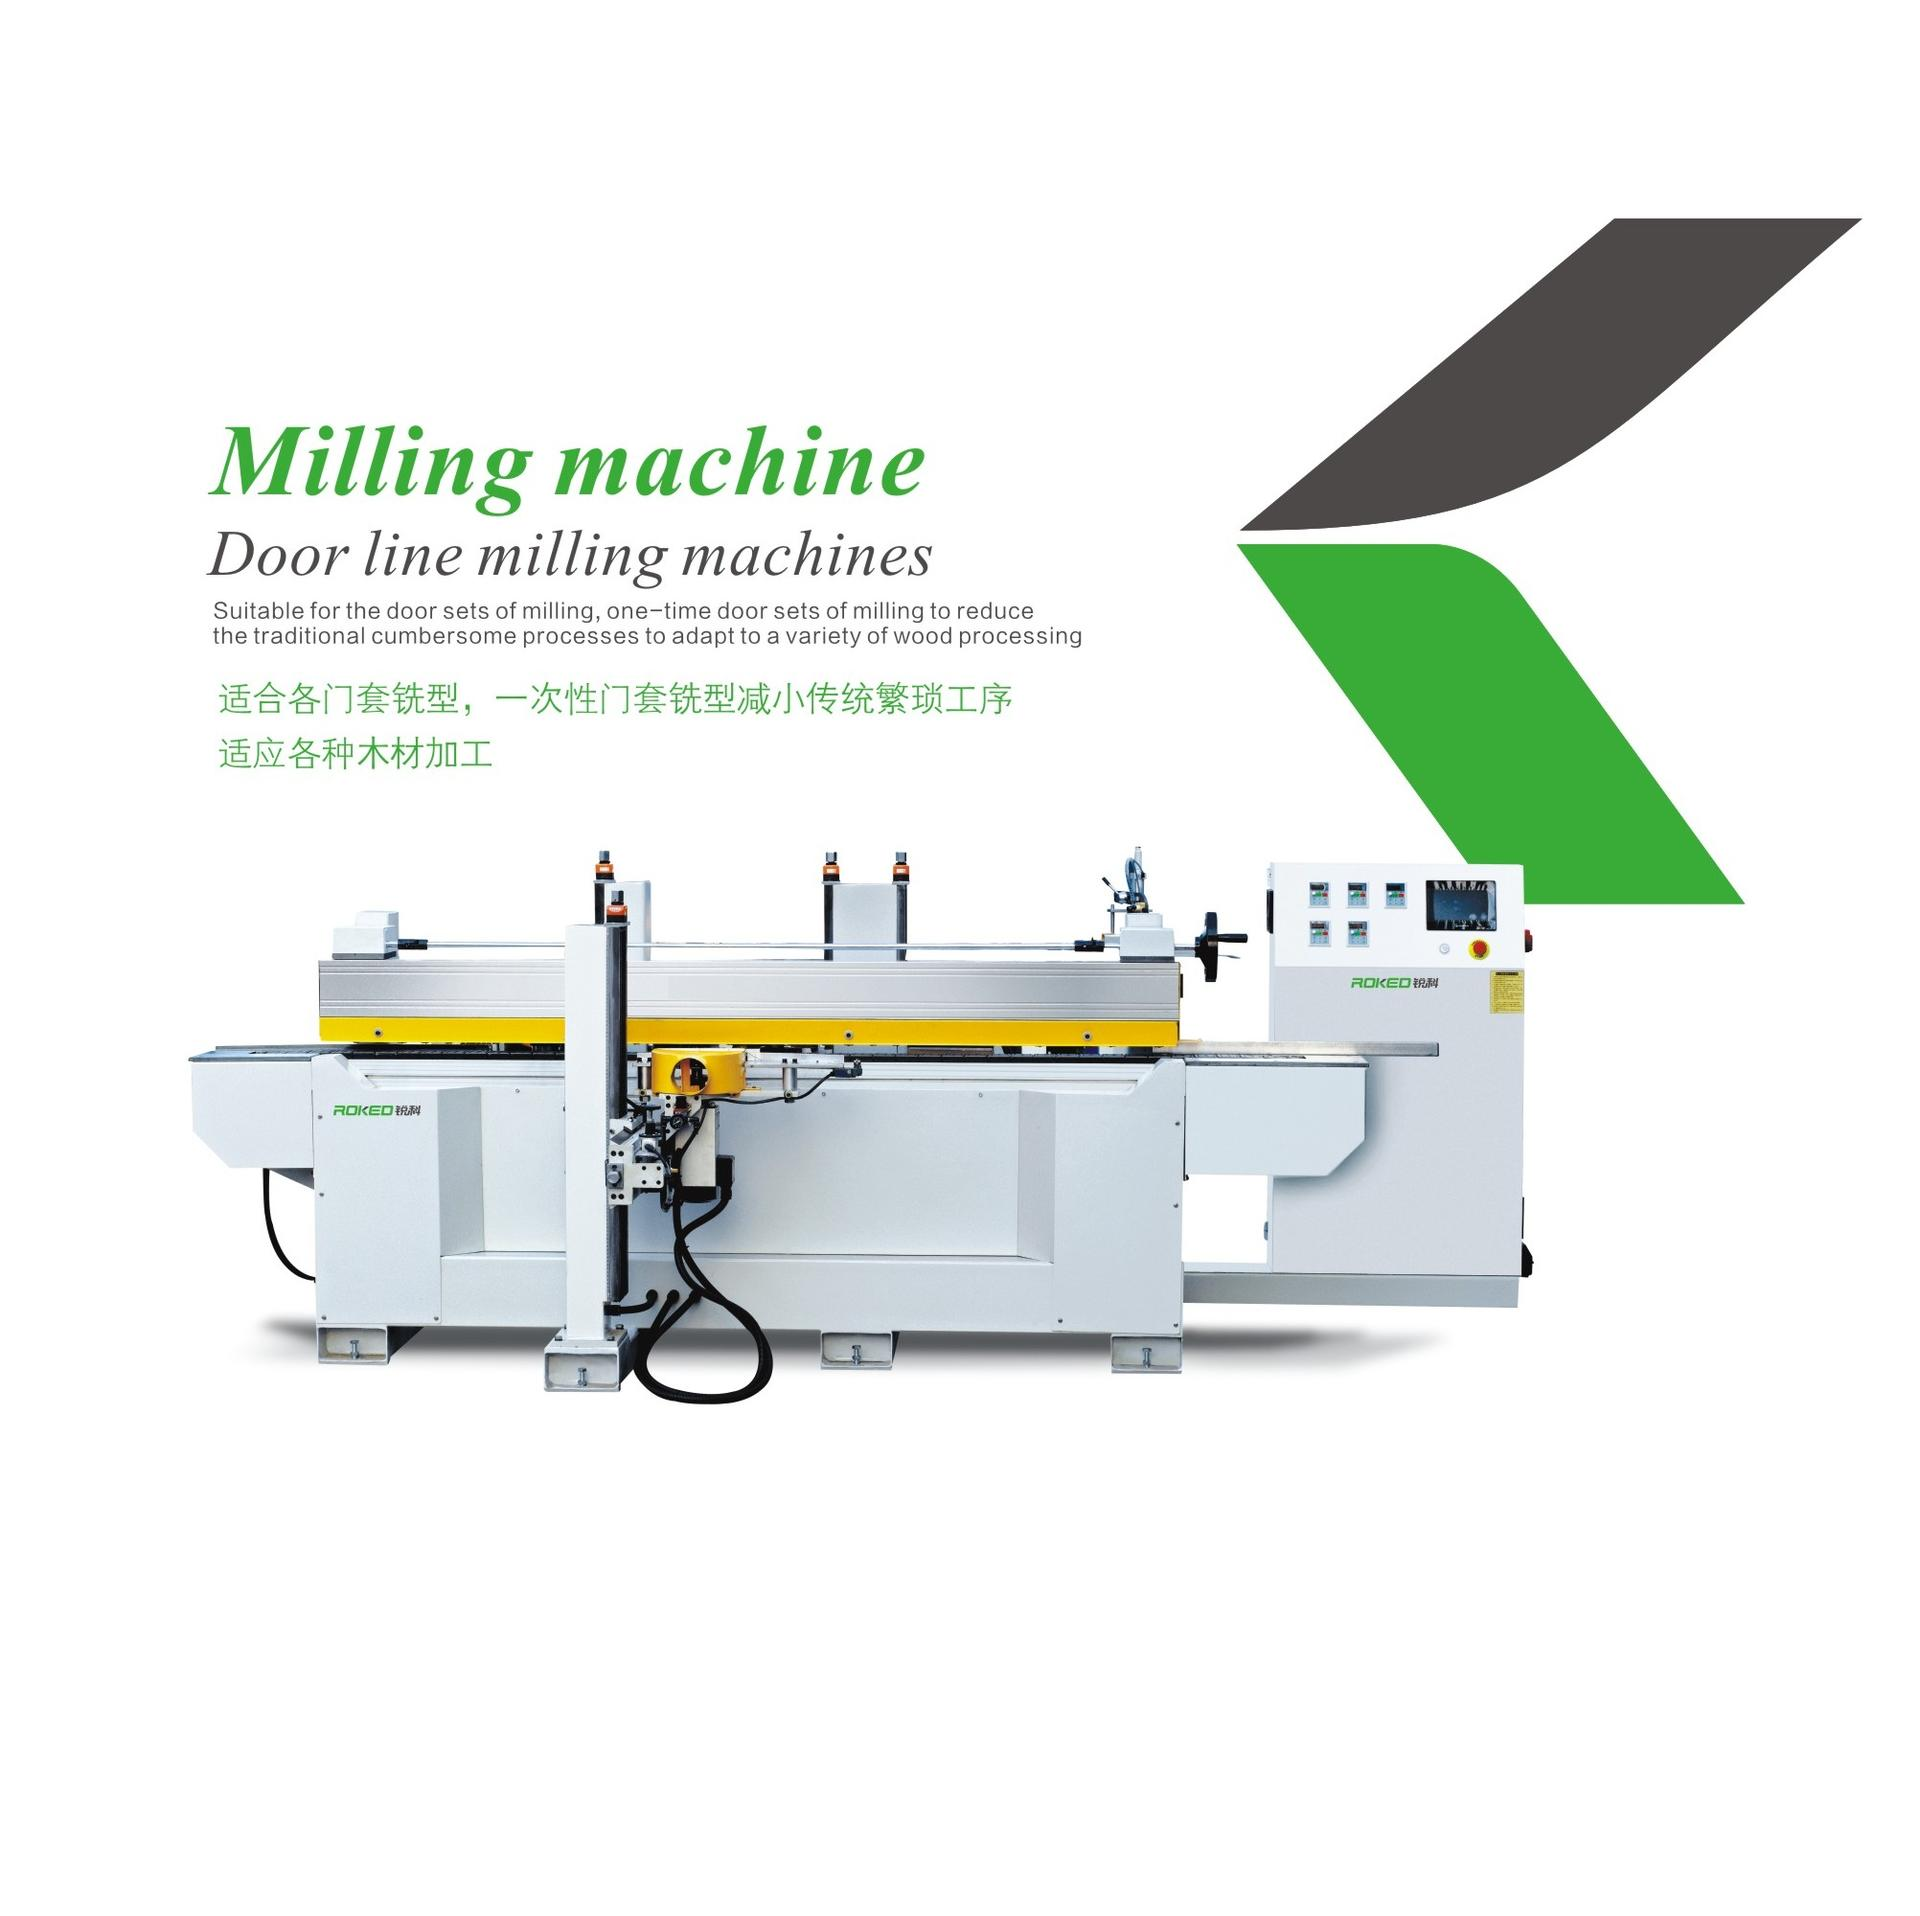 SANHOMT/Yongjili/ROKED   Milling machine Door line milling machine RK-MTX-4X